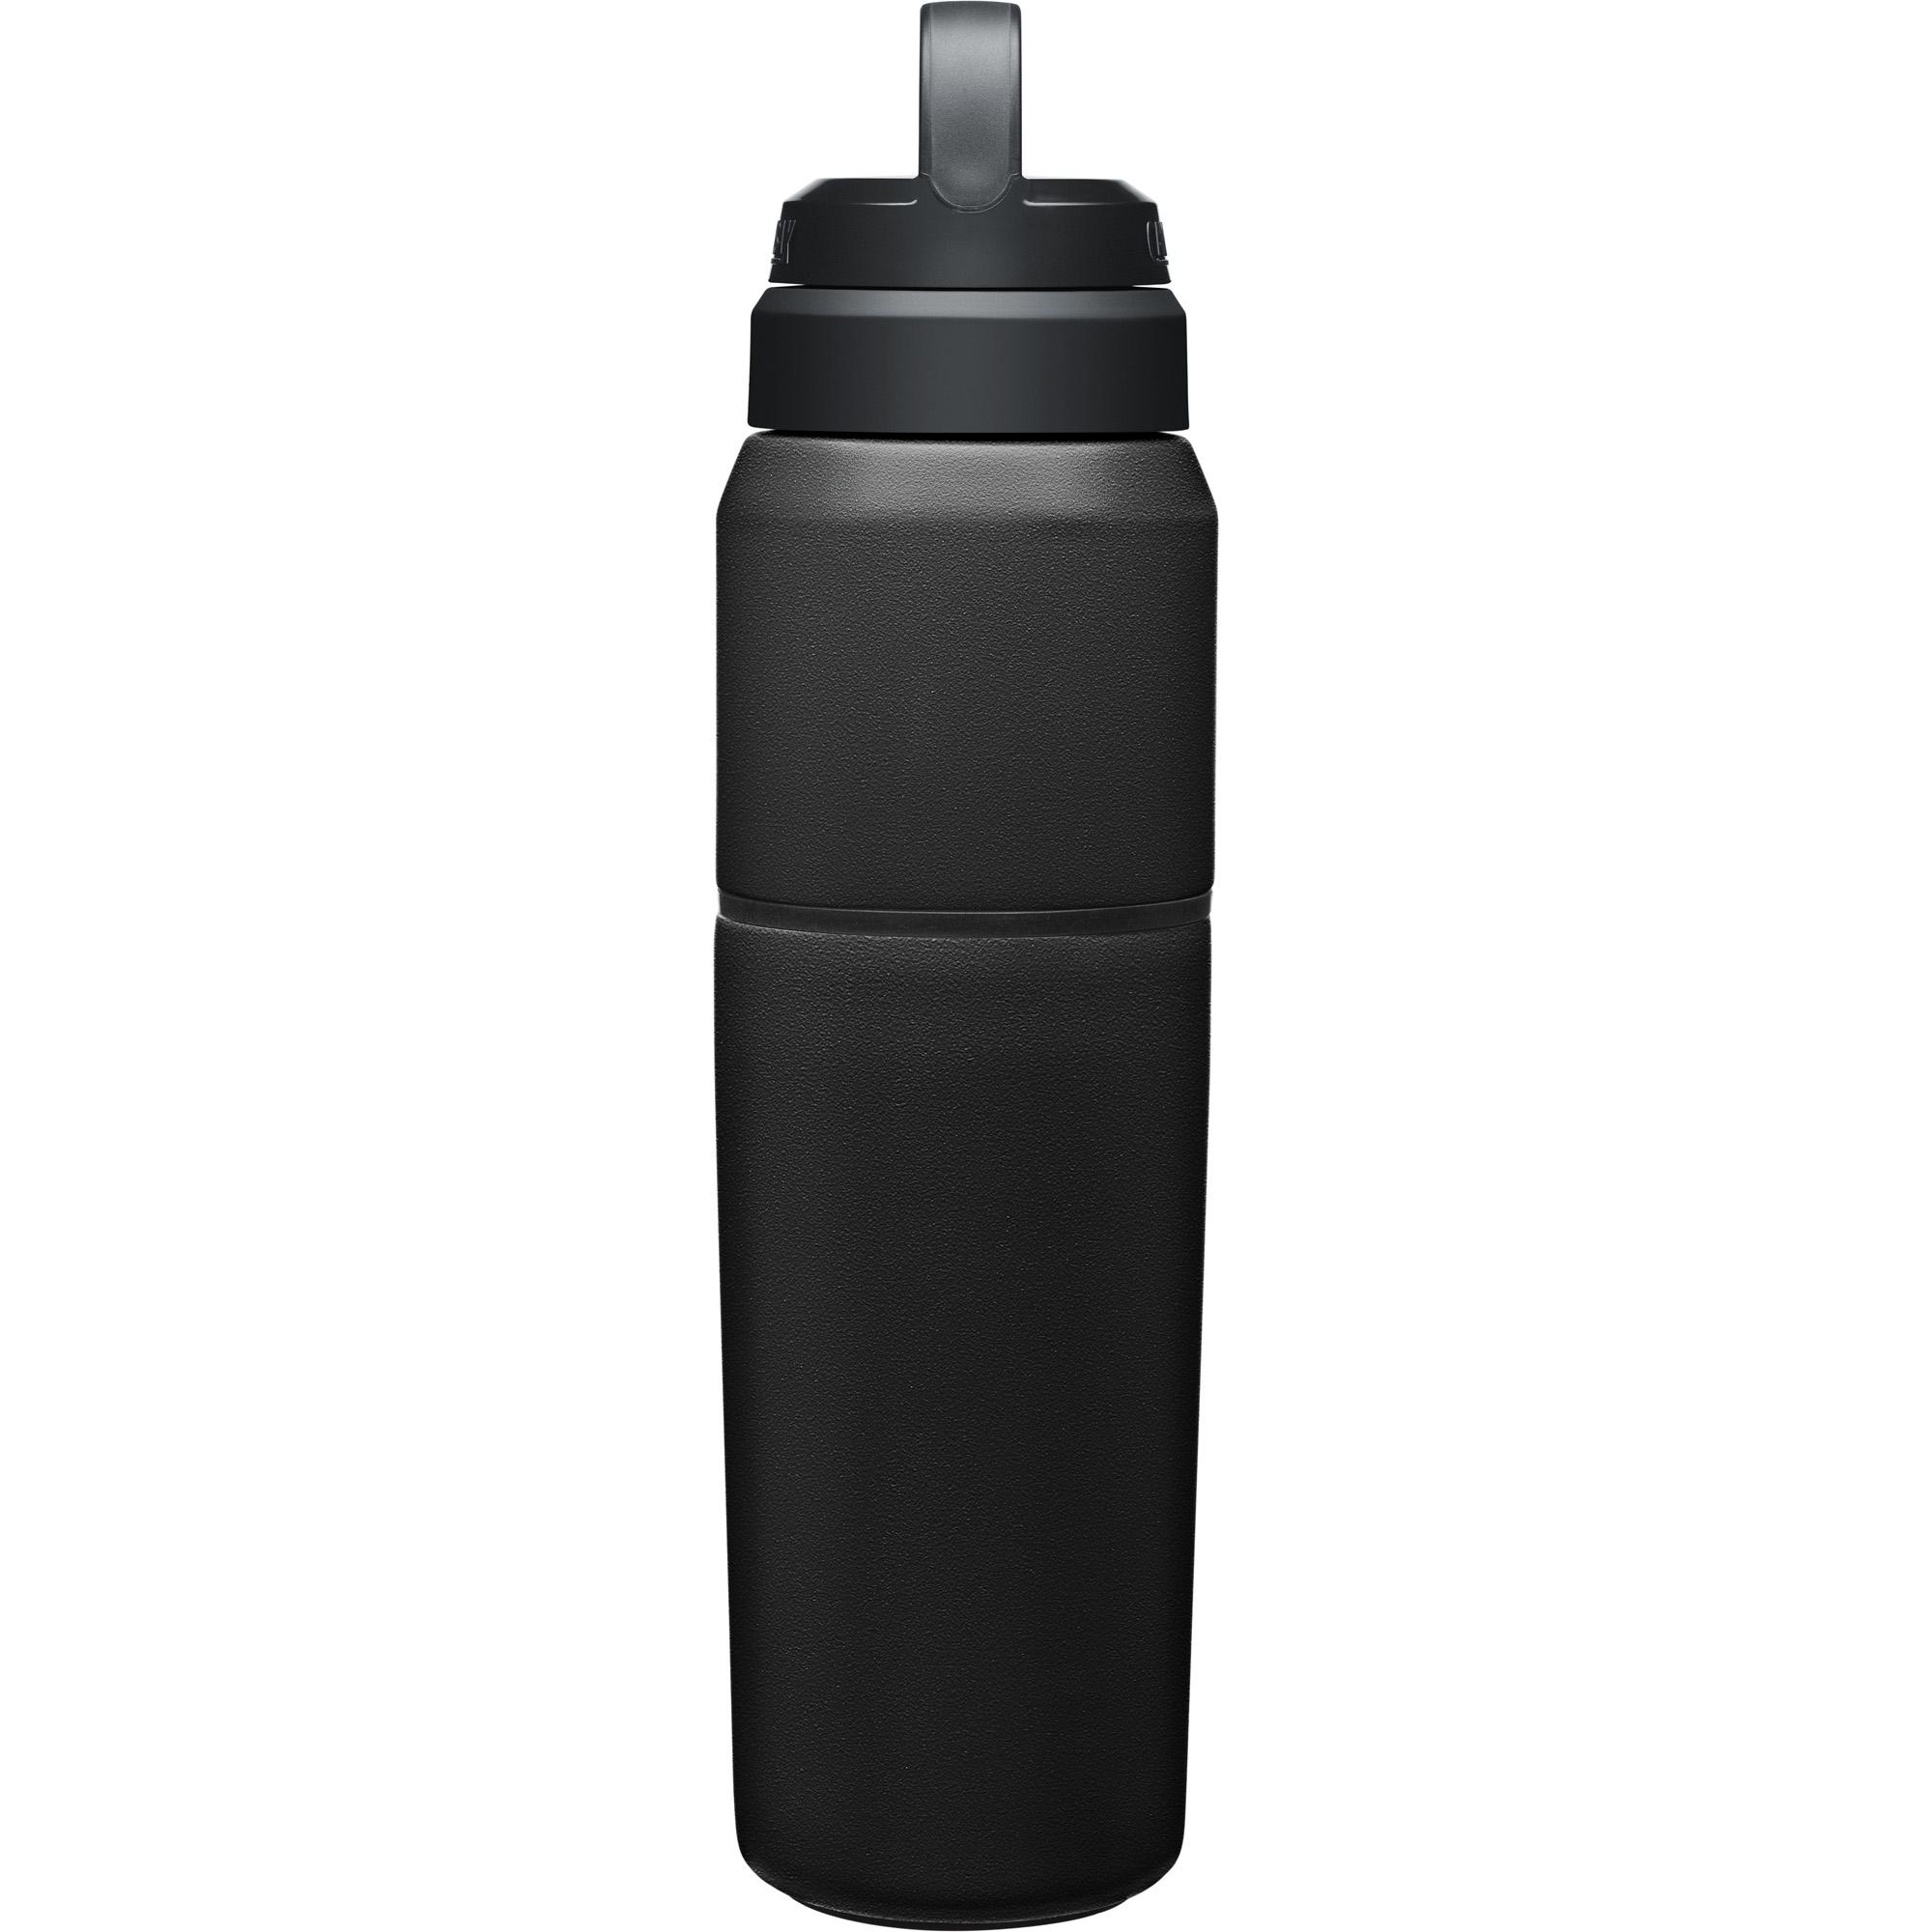 Camelbak Mb 22oz Bottle/cup Black